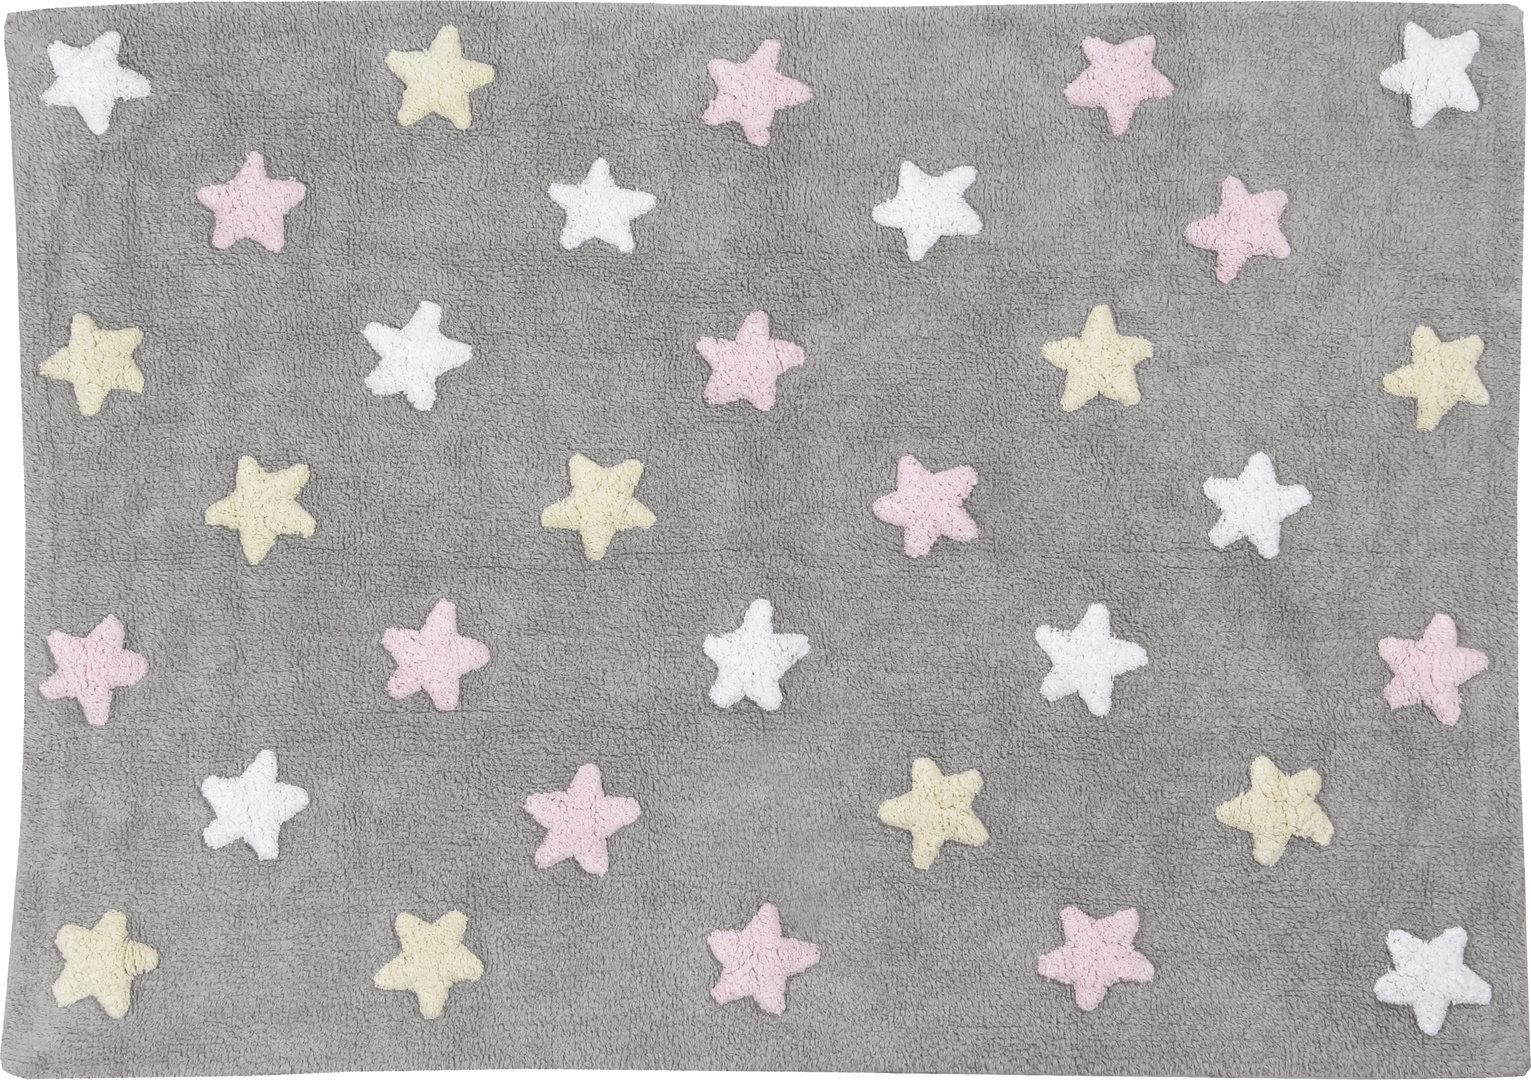 alfombra lorena canals gris tricolor stars rosa